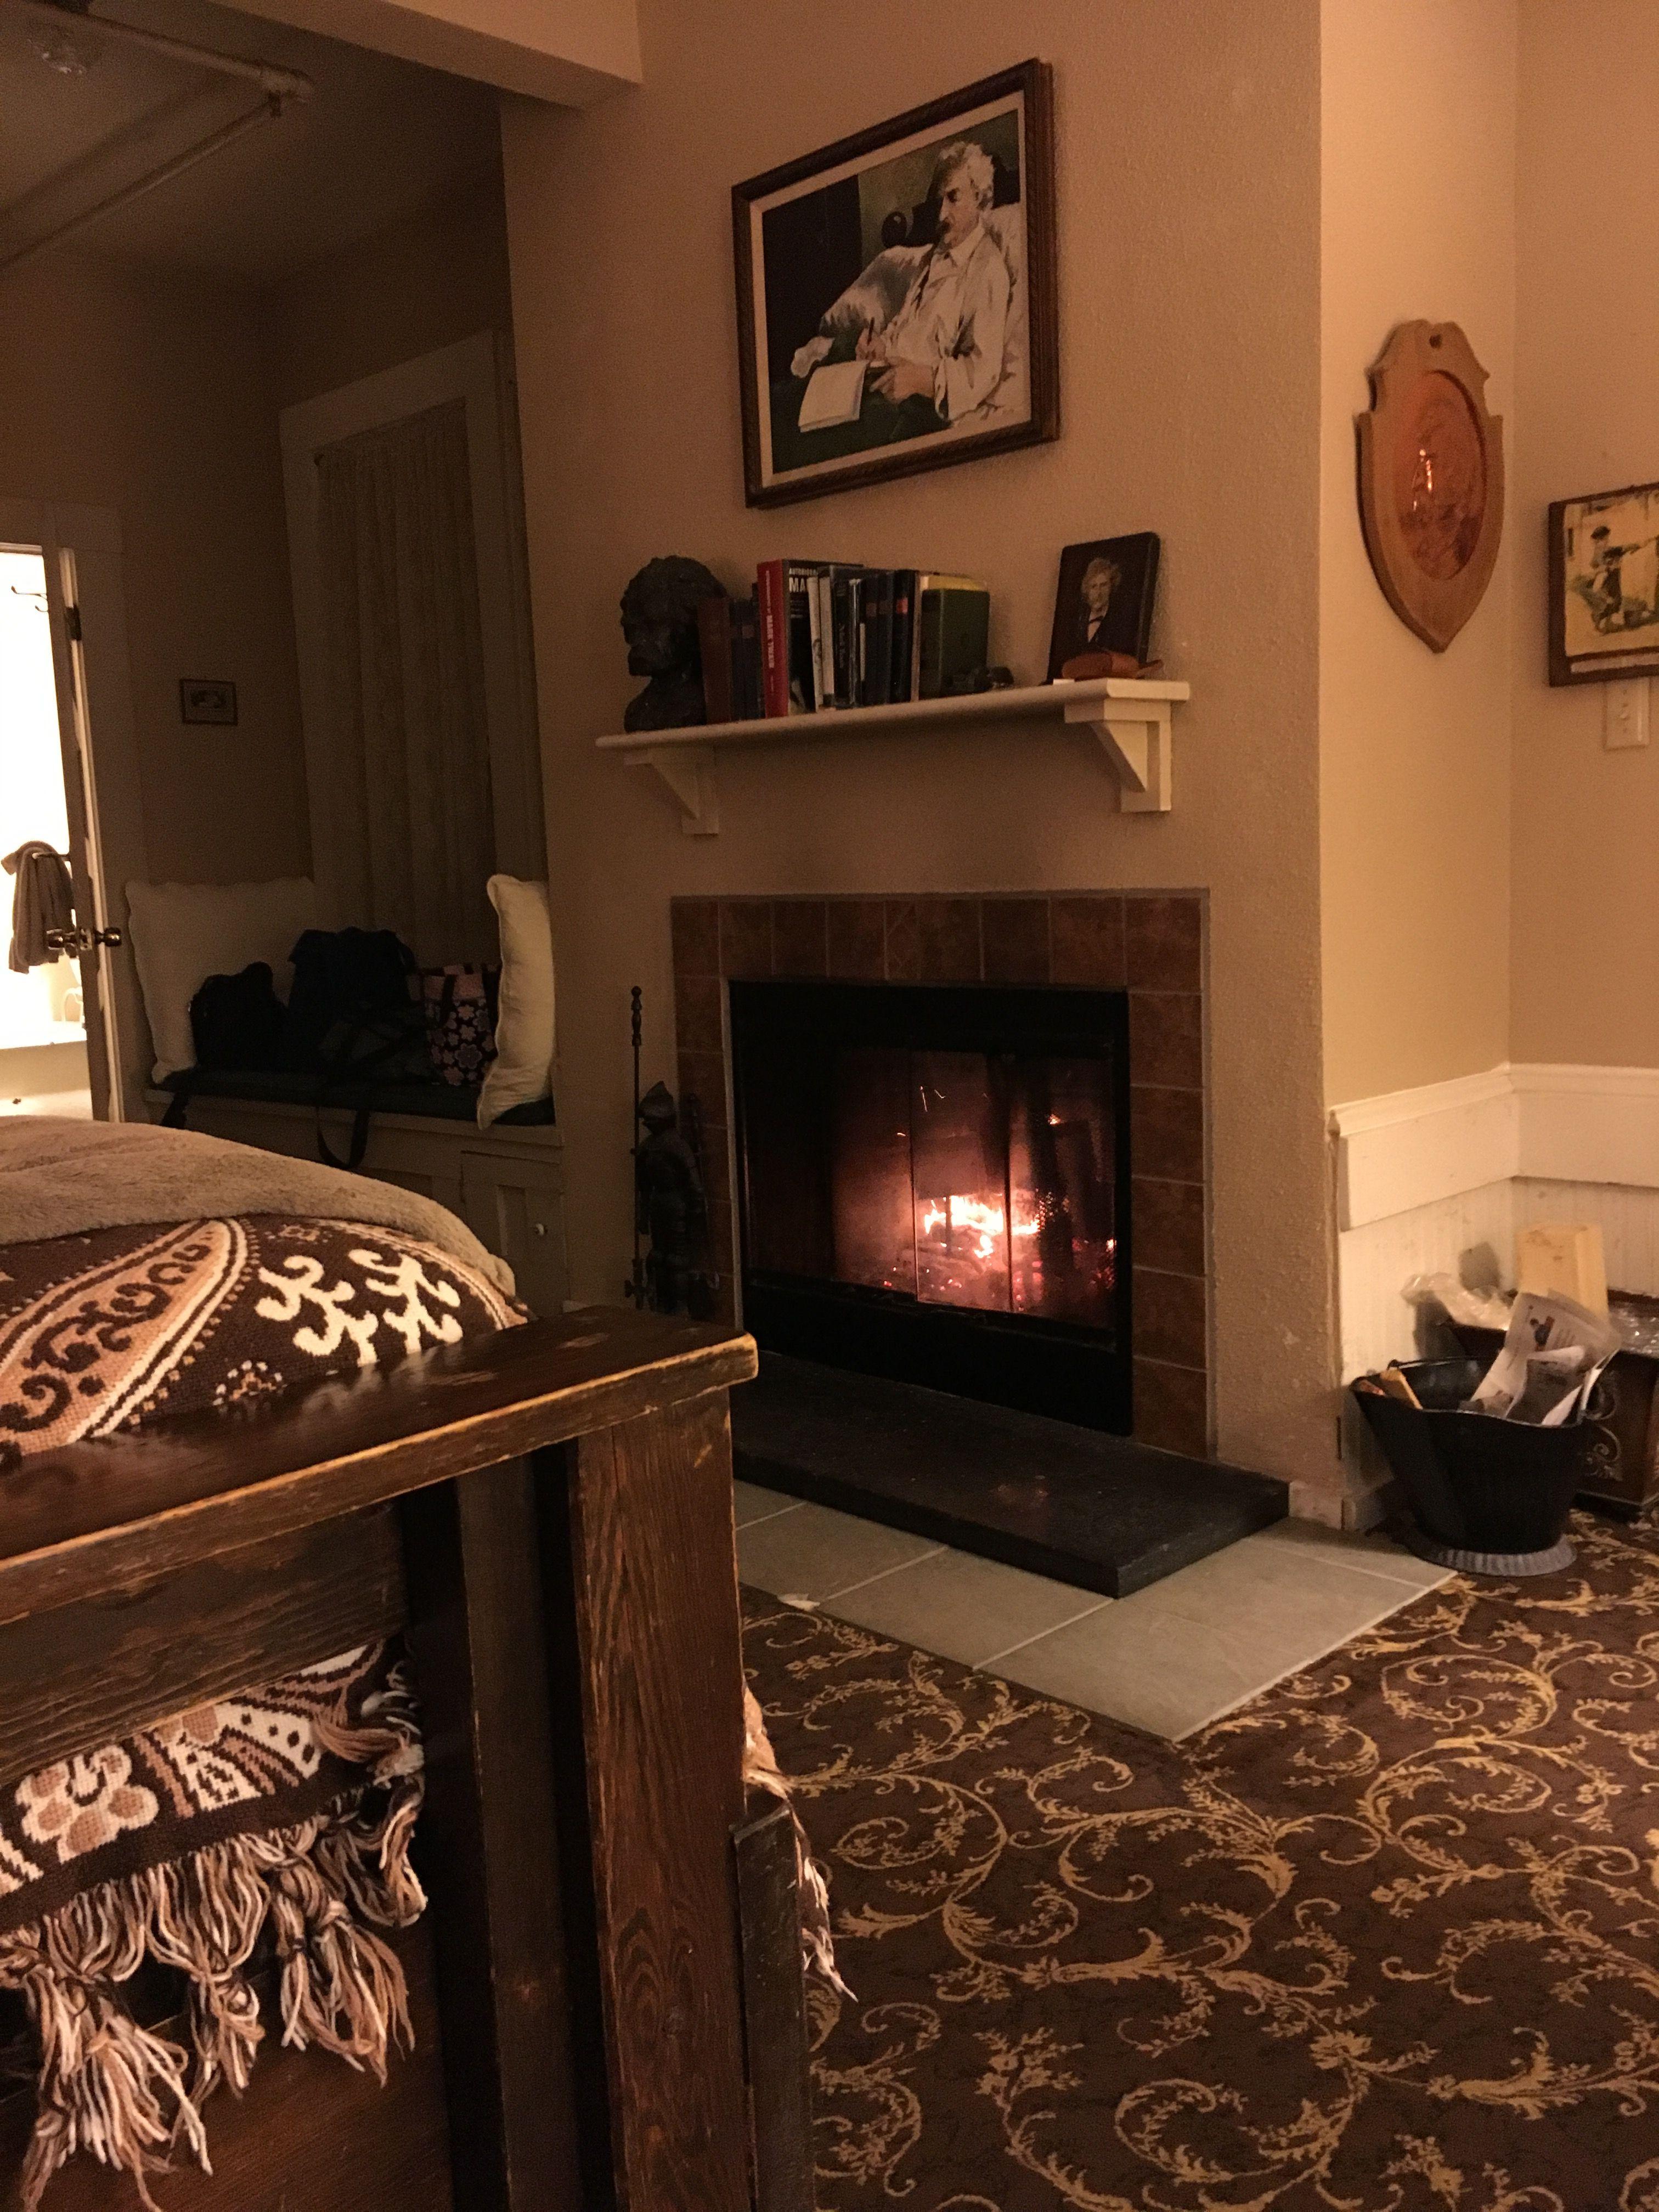 Cozy Fire in Mark Twain Beach hotels, Hotel, Decor